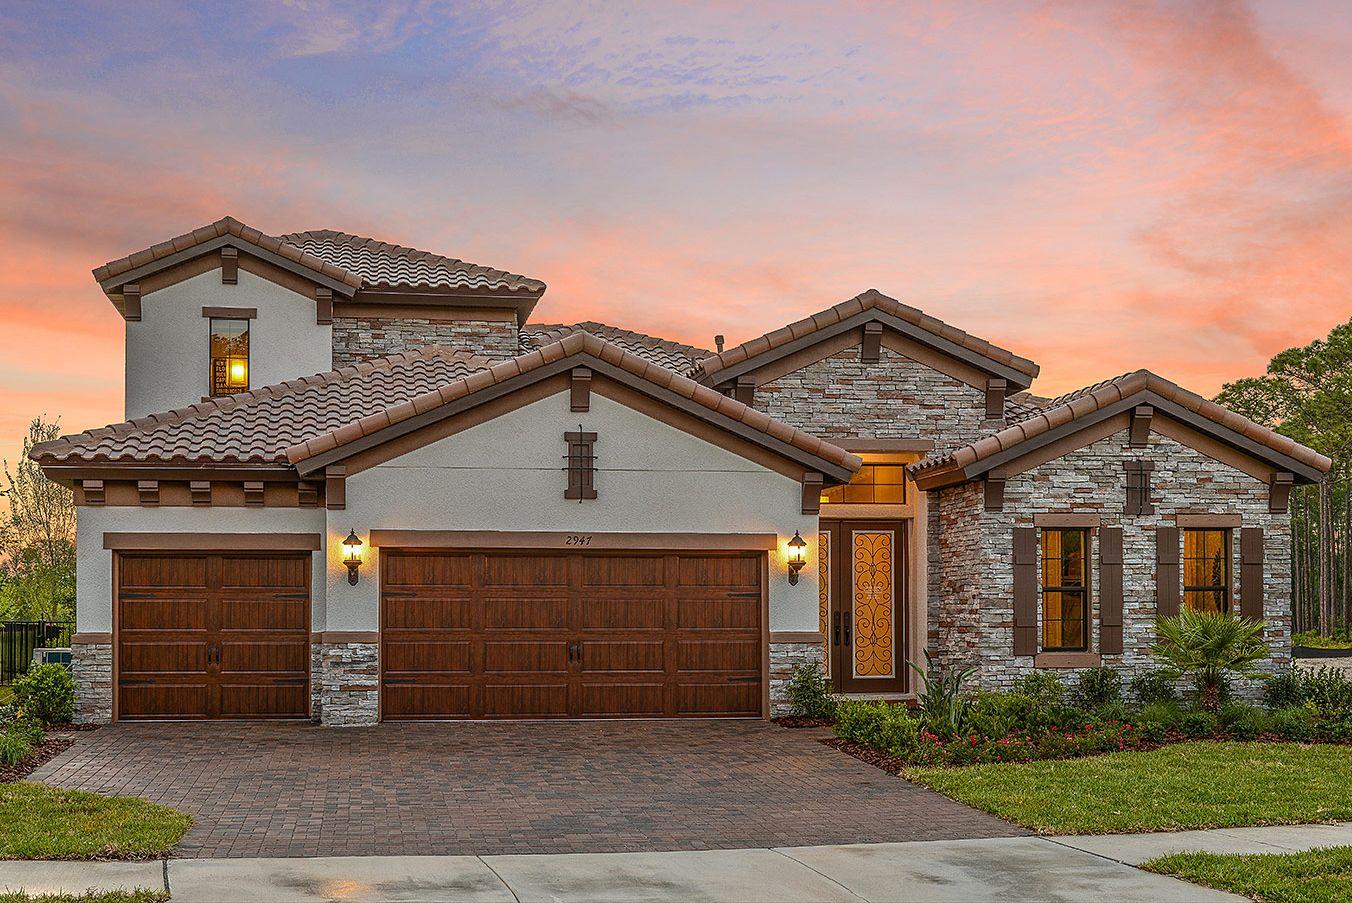 Single Family for Active at Granada Ii 11350 Hawks Fern Drive Lithia, Florida 33547 United States